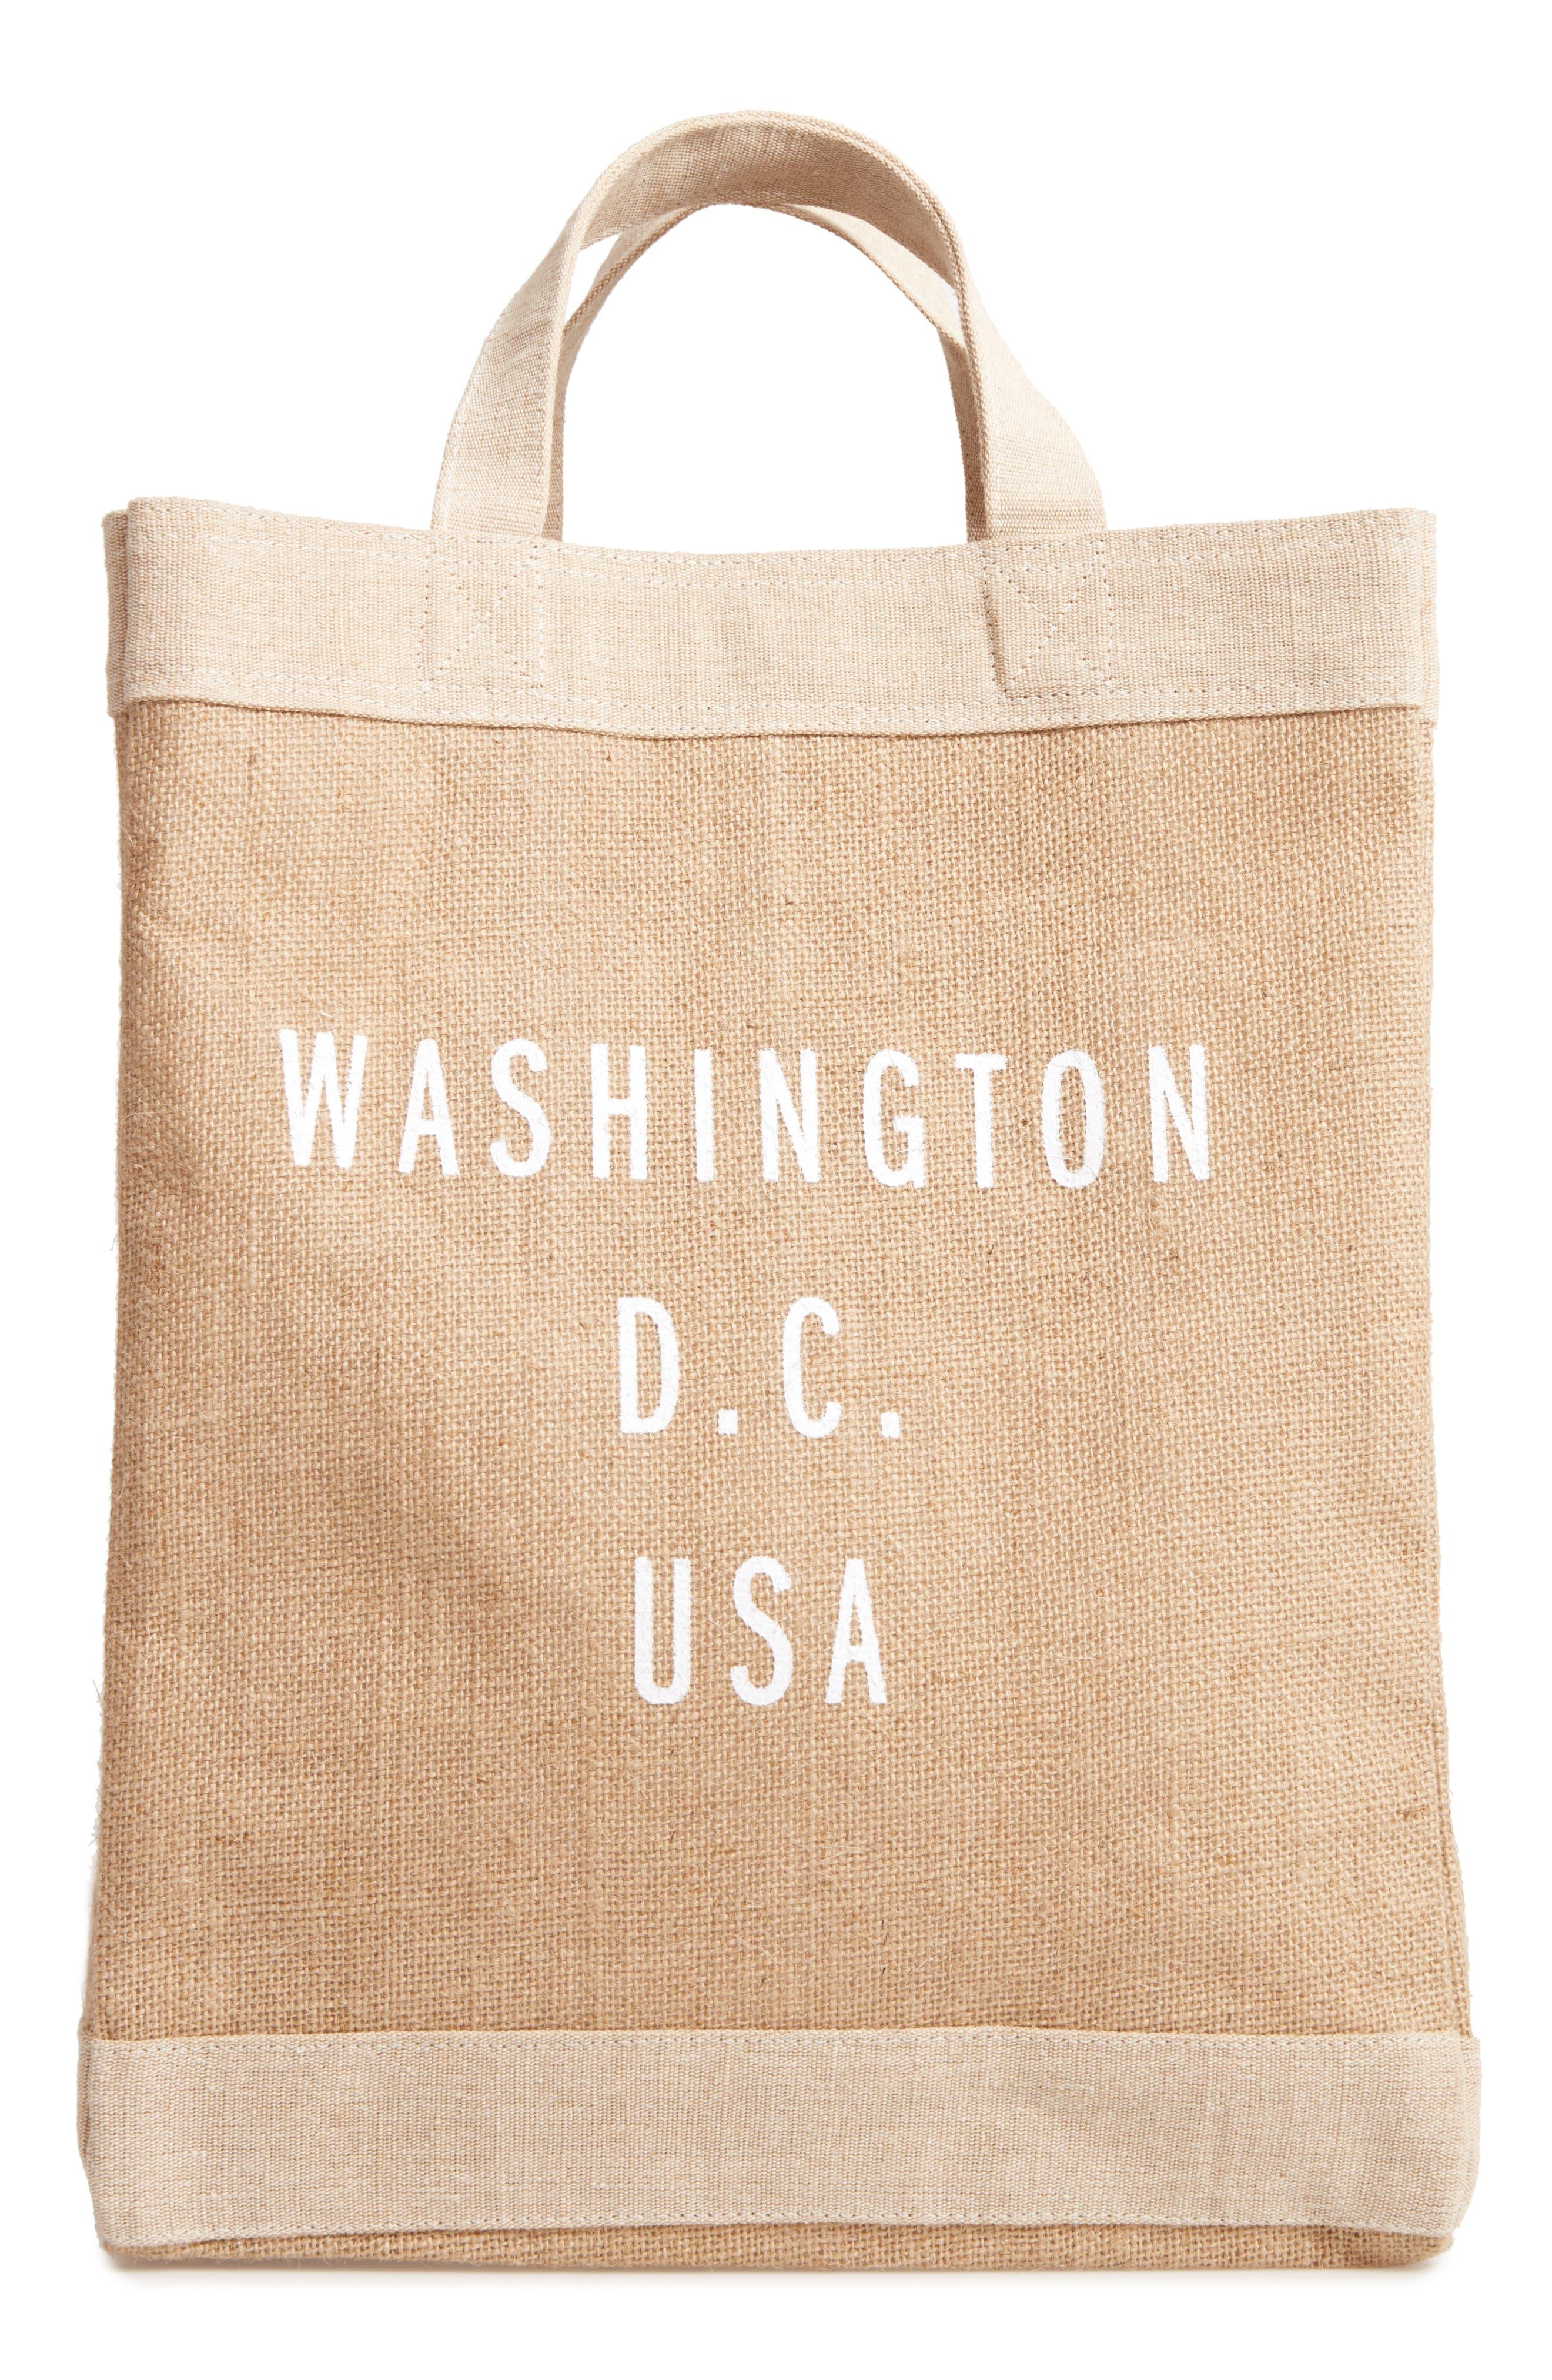 APOLIS WASHINGTON D.C. SIMPLE MARKET BAG - BROWN